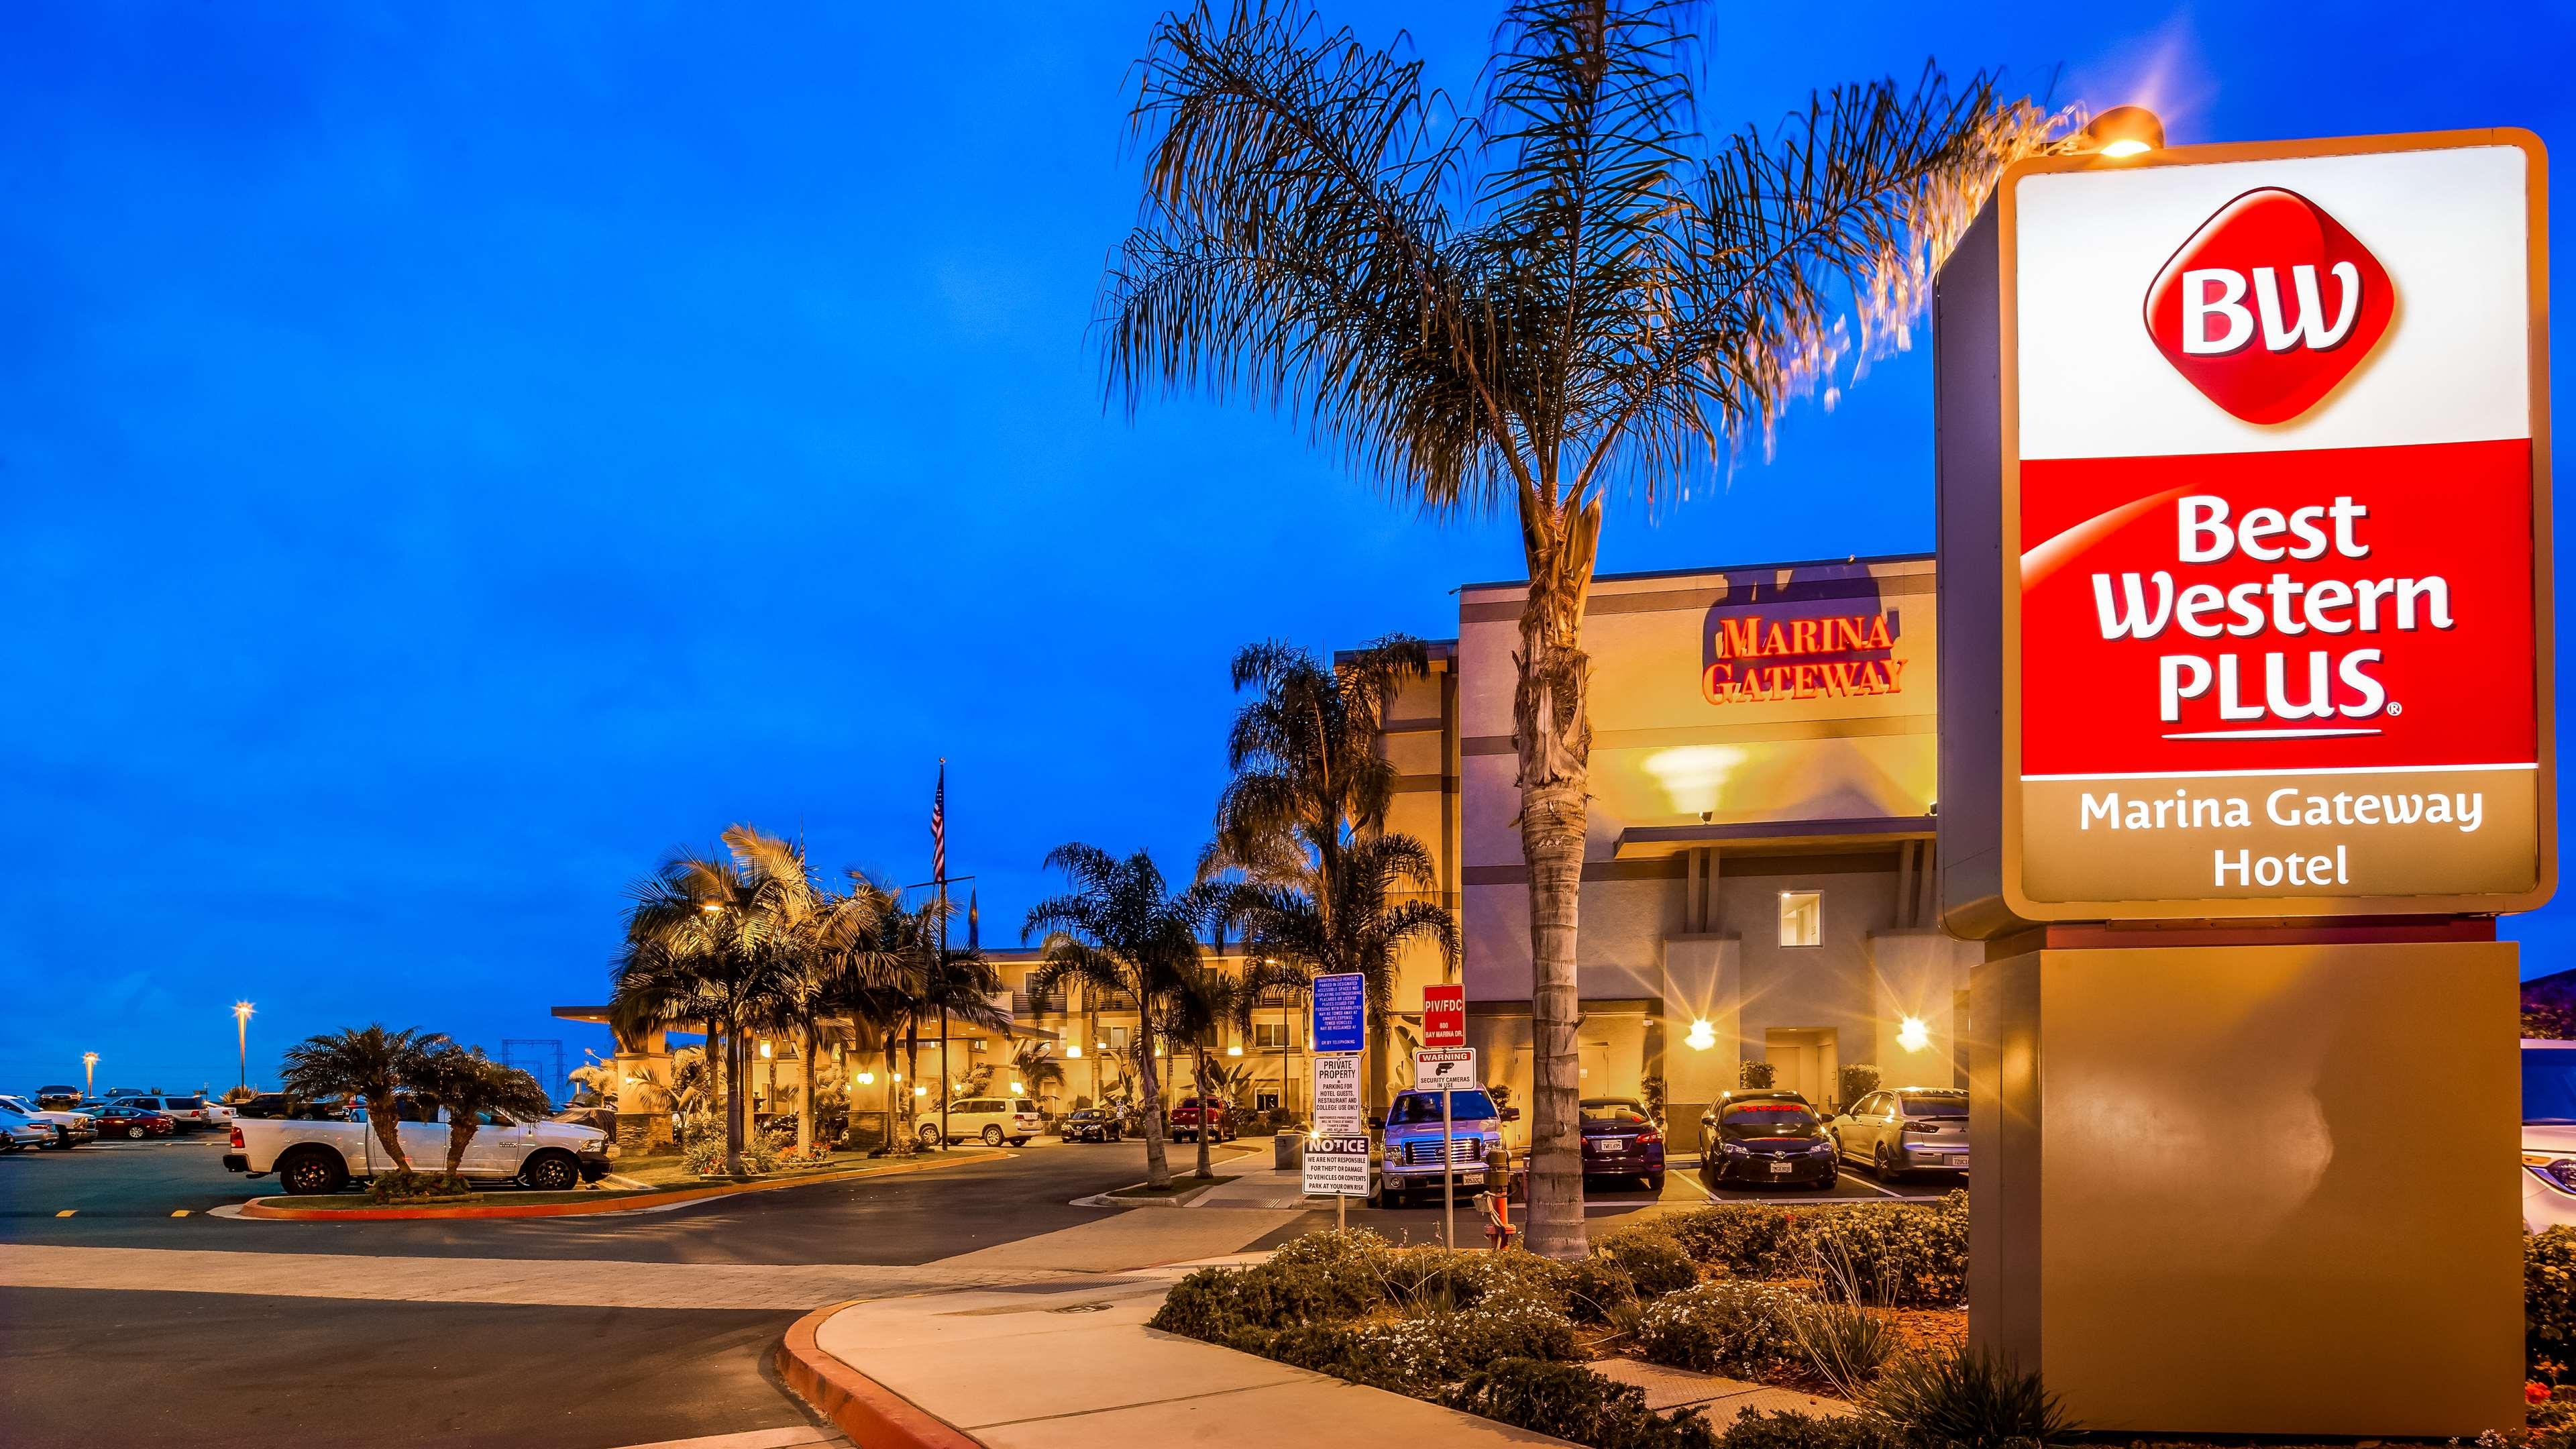 Best Western Plus Marina Gateway Hotel image 2